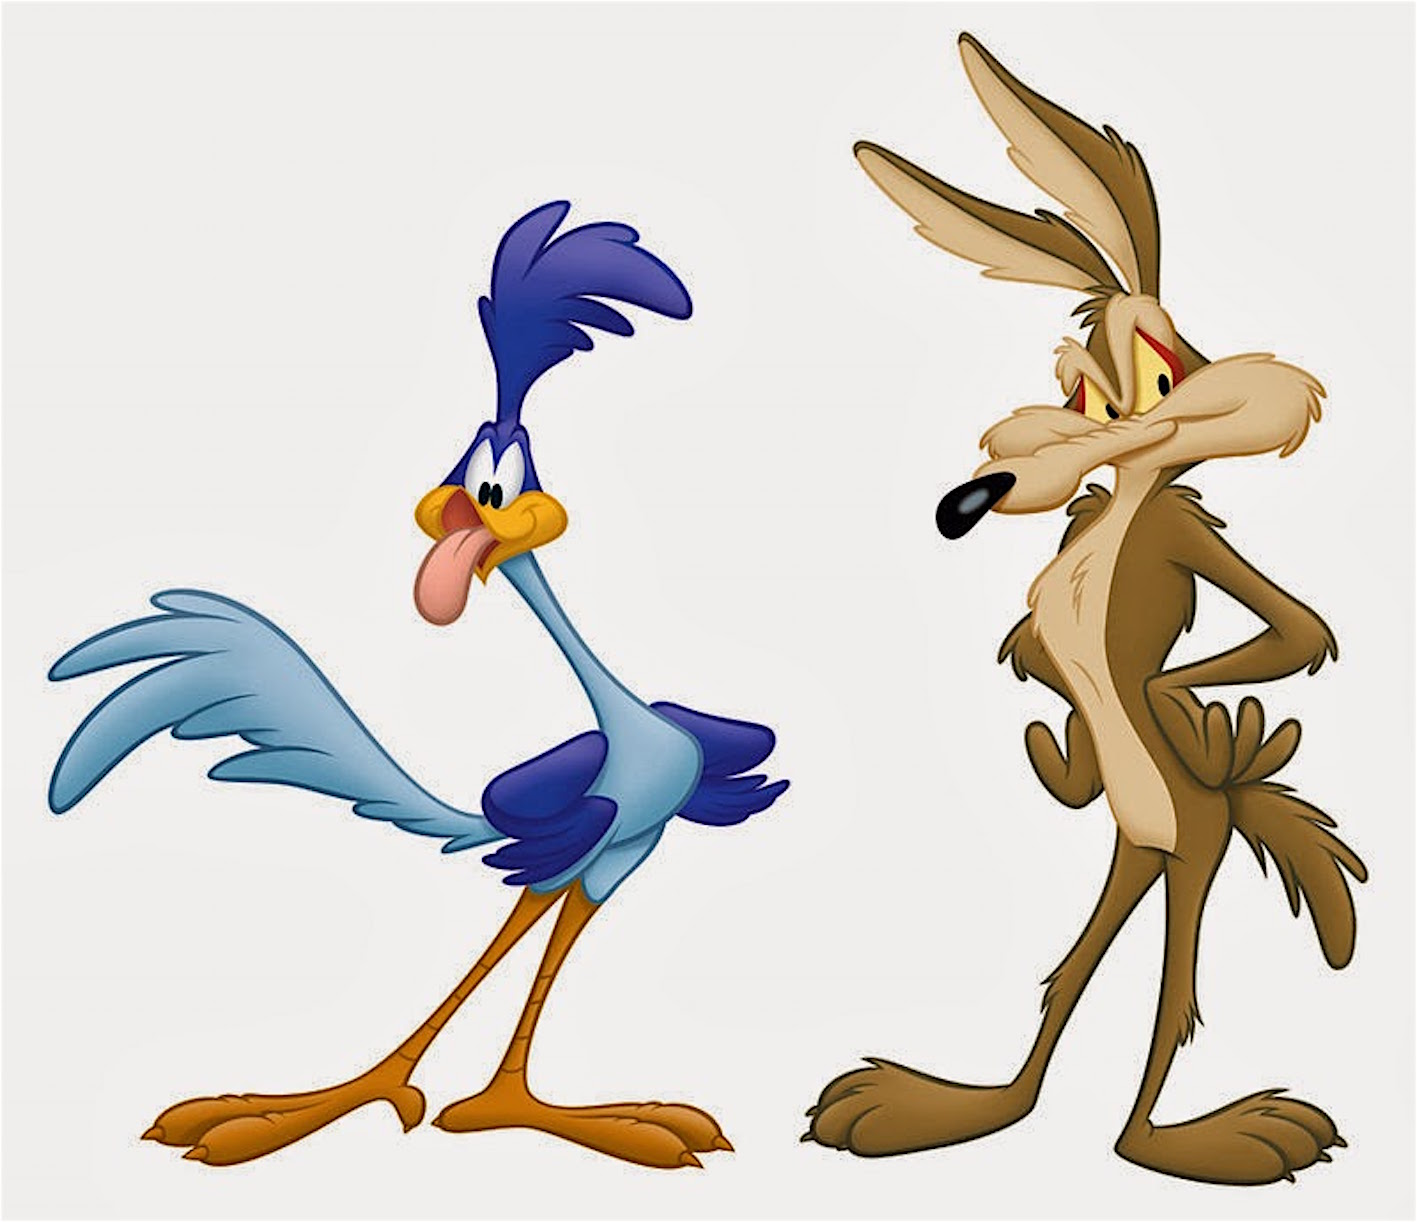 Road runner wile coyote dal cartoni anni